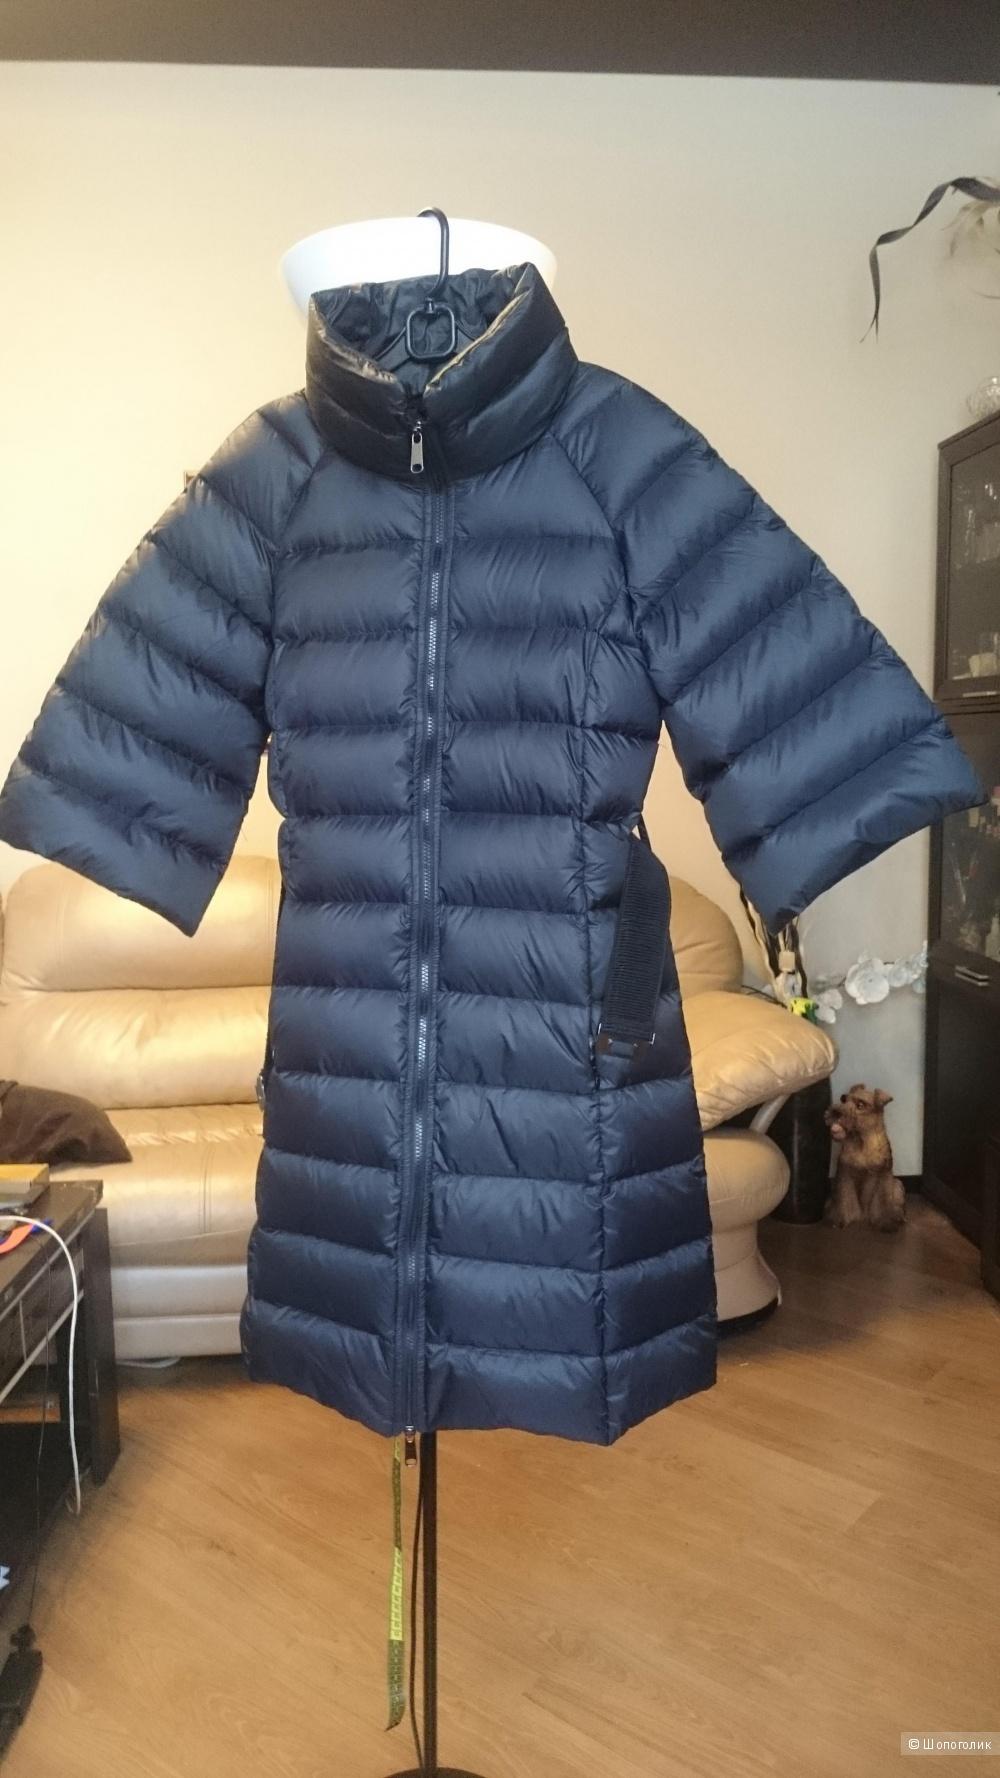 Пуховик -пальто Inciti размер 46.